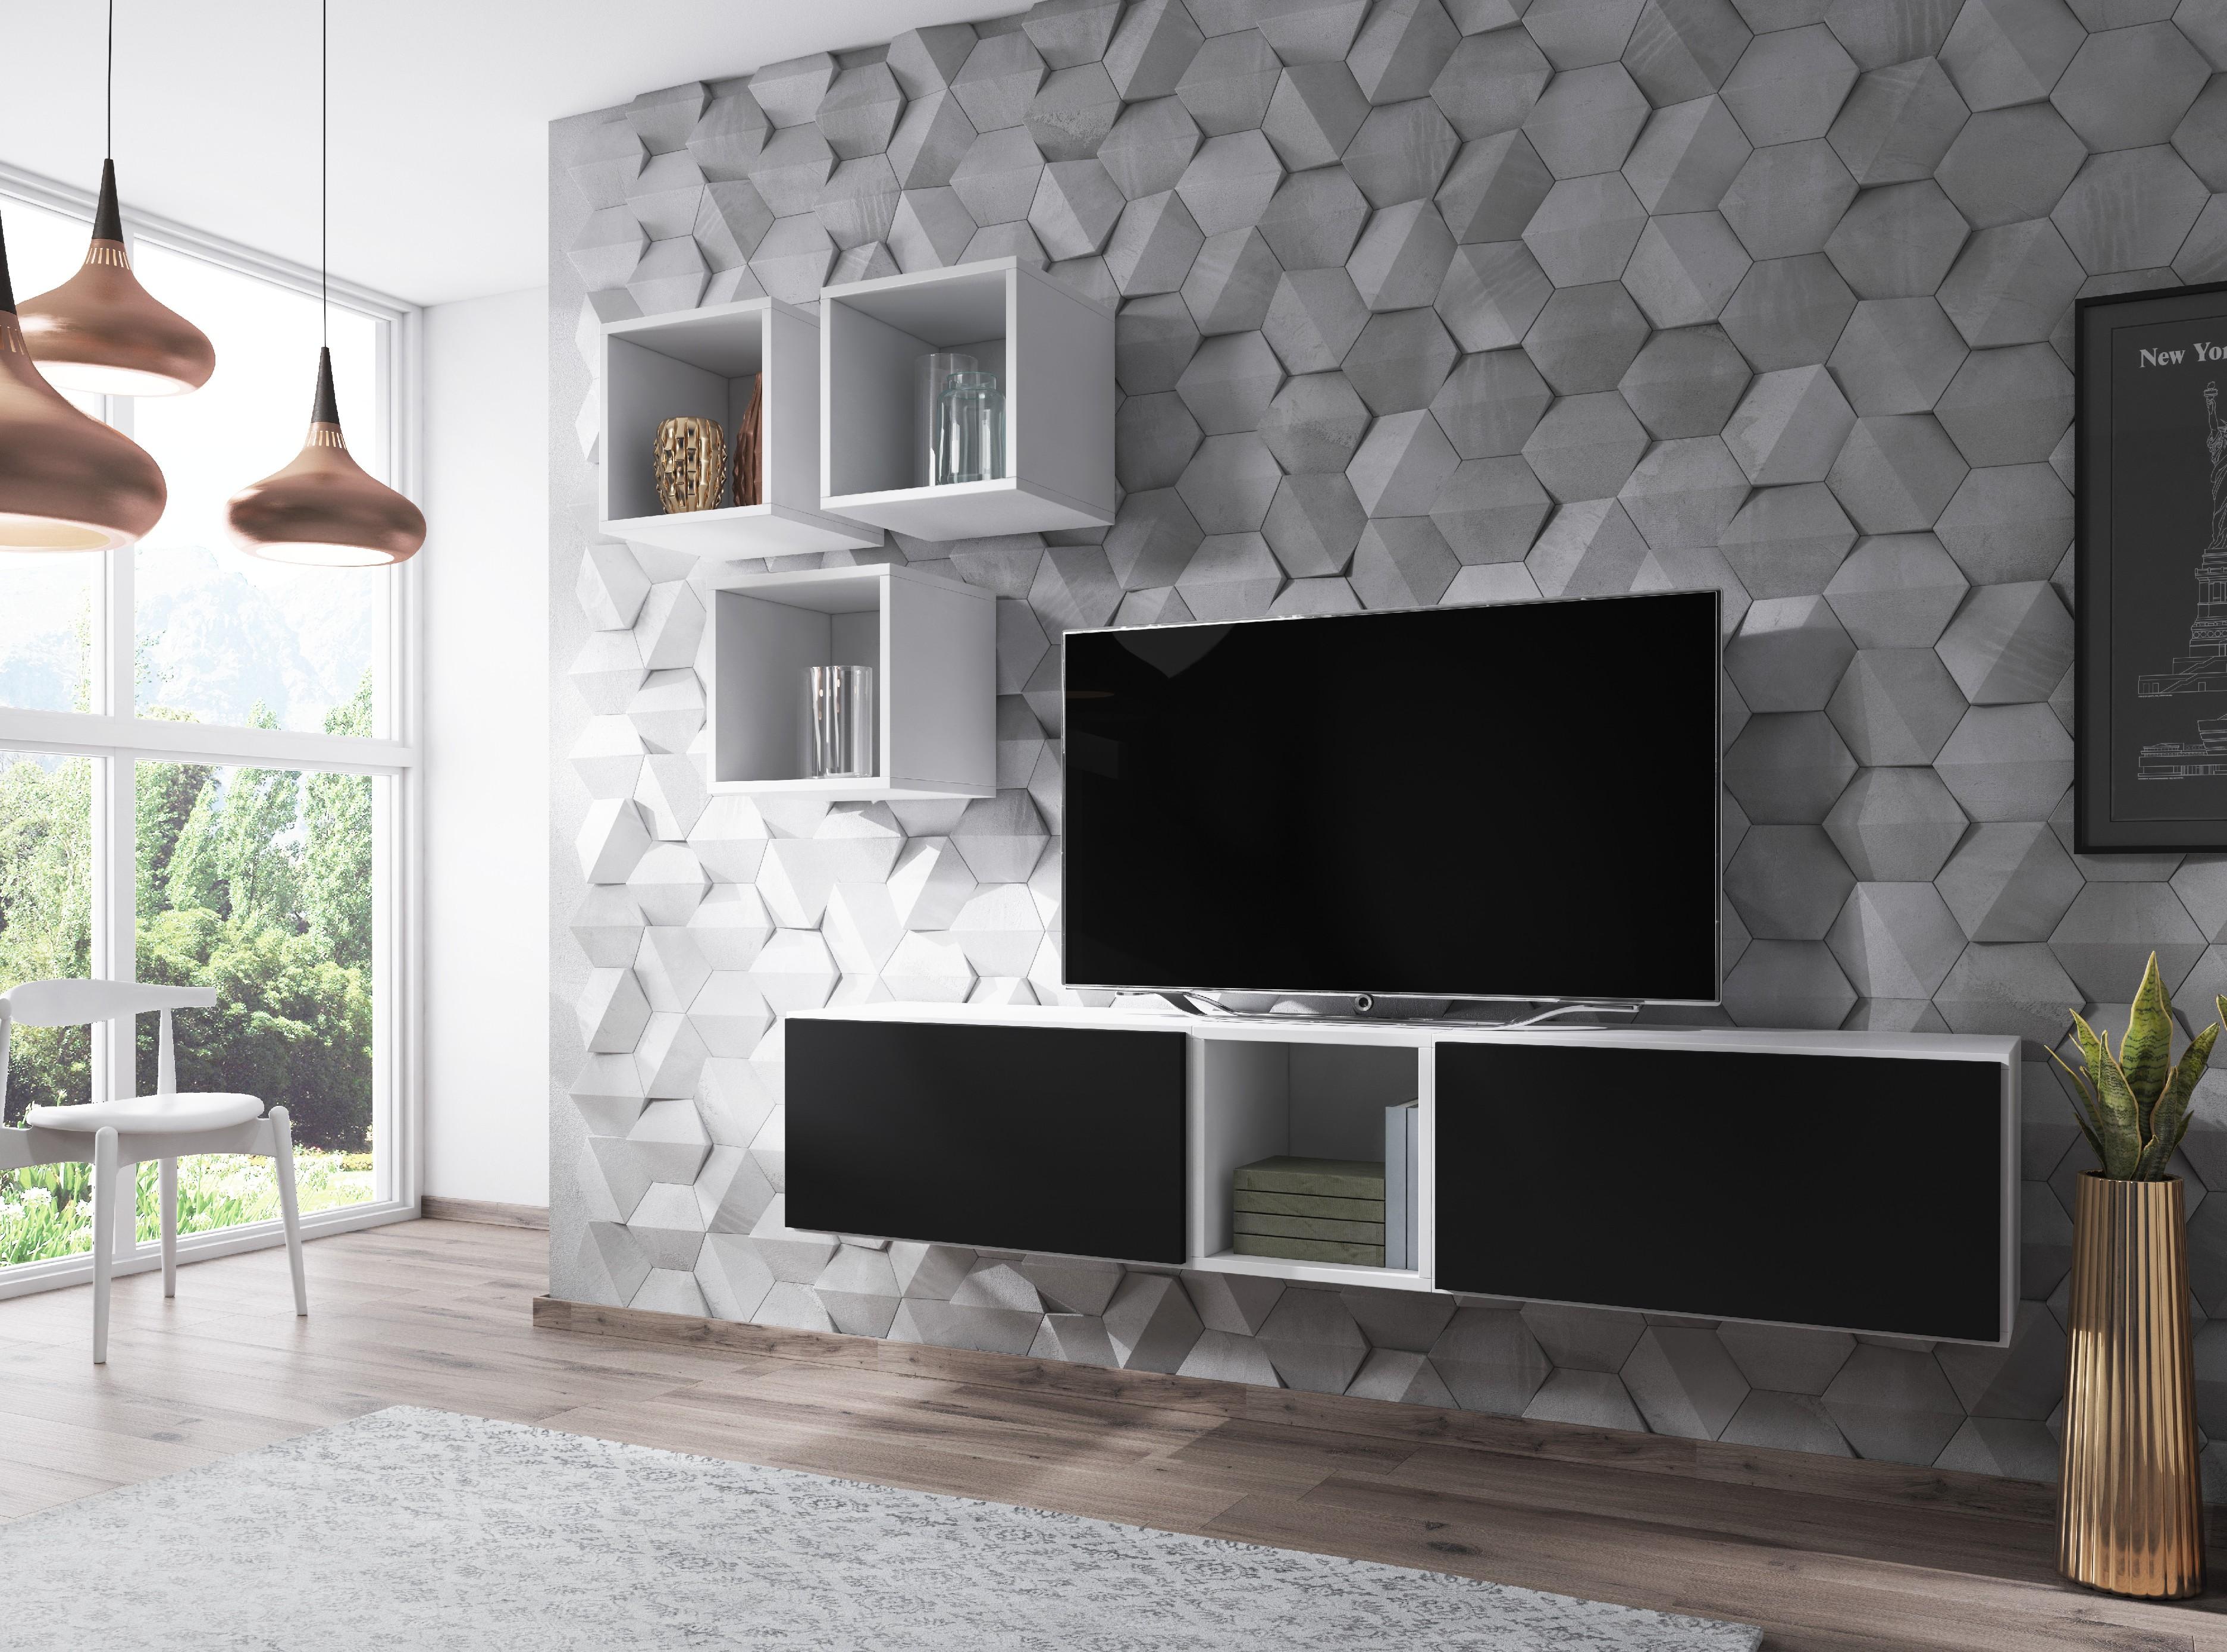 Artcam Obývacia stena ROCO 8 roco: korpus biely mat / okraj biely mat / dvierka čierny mat